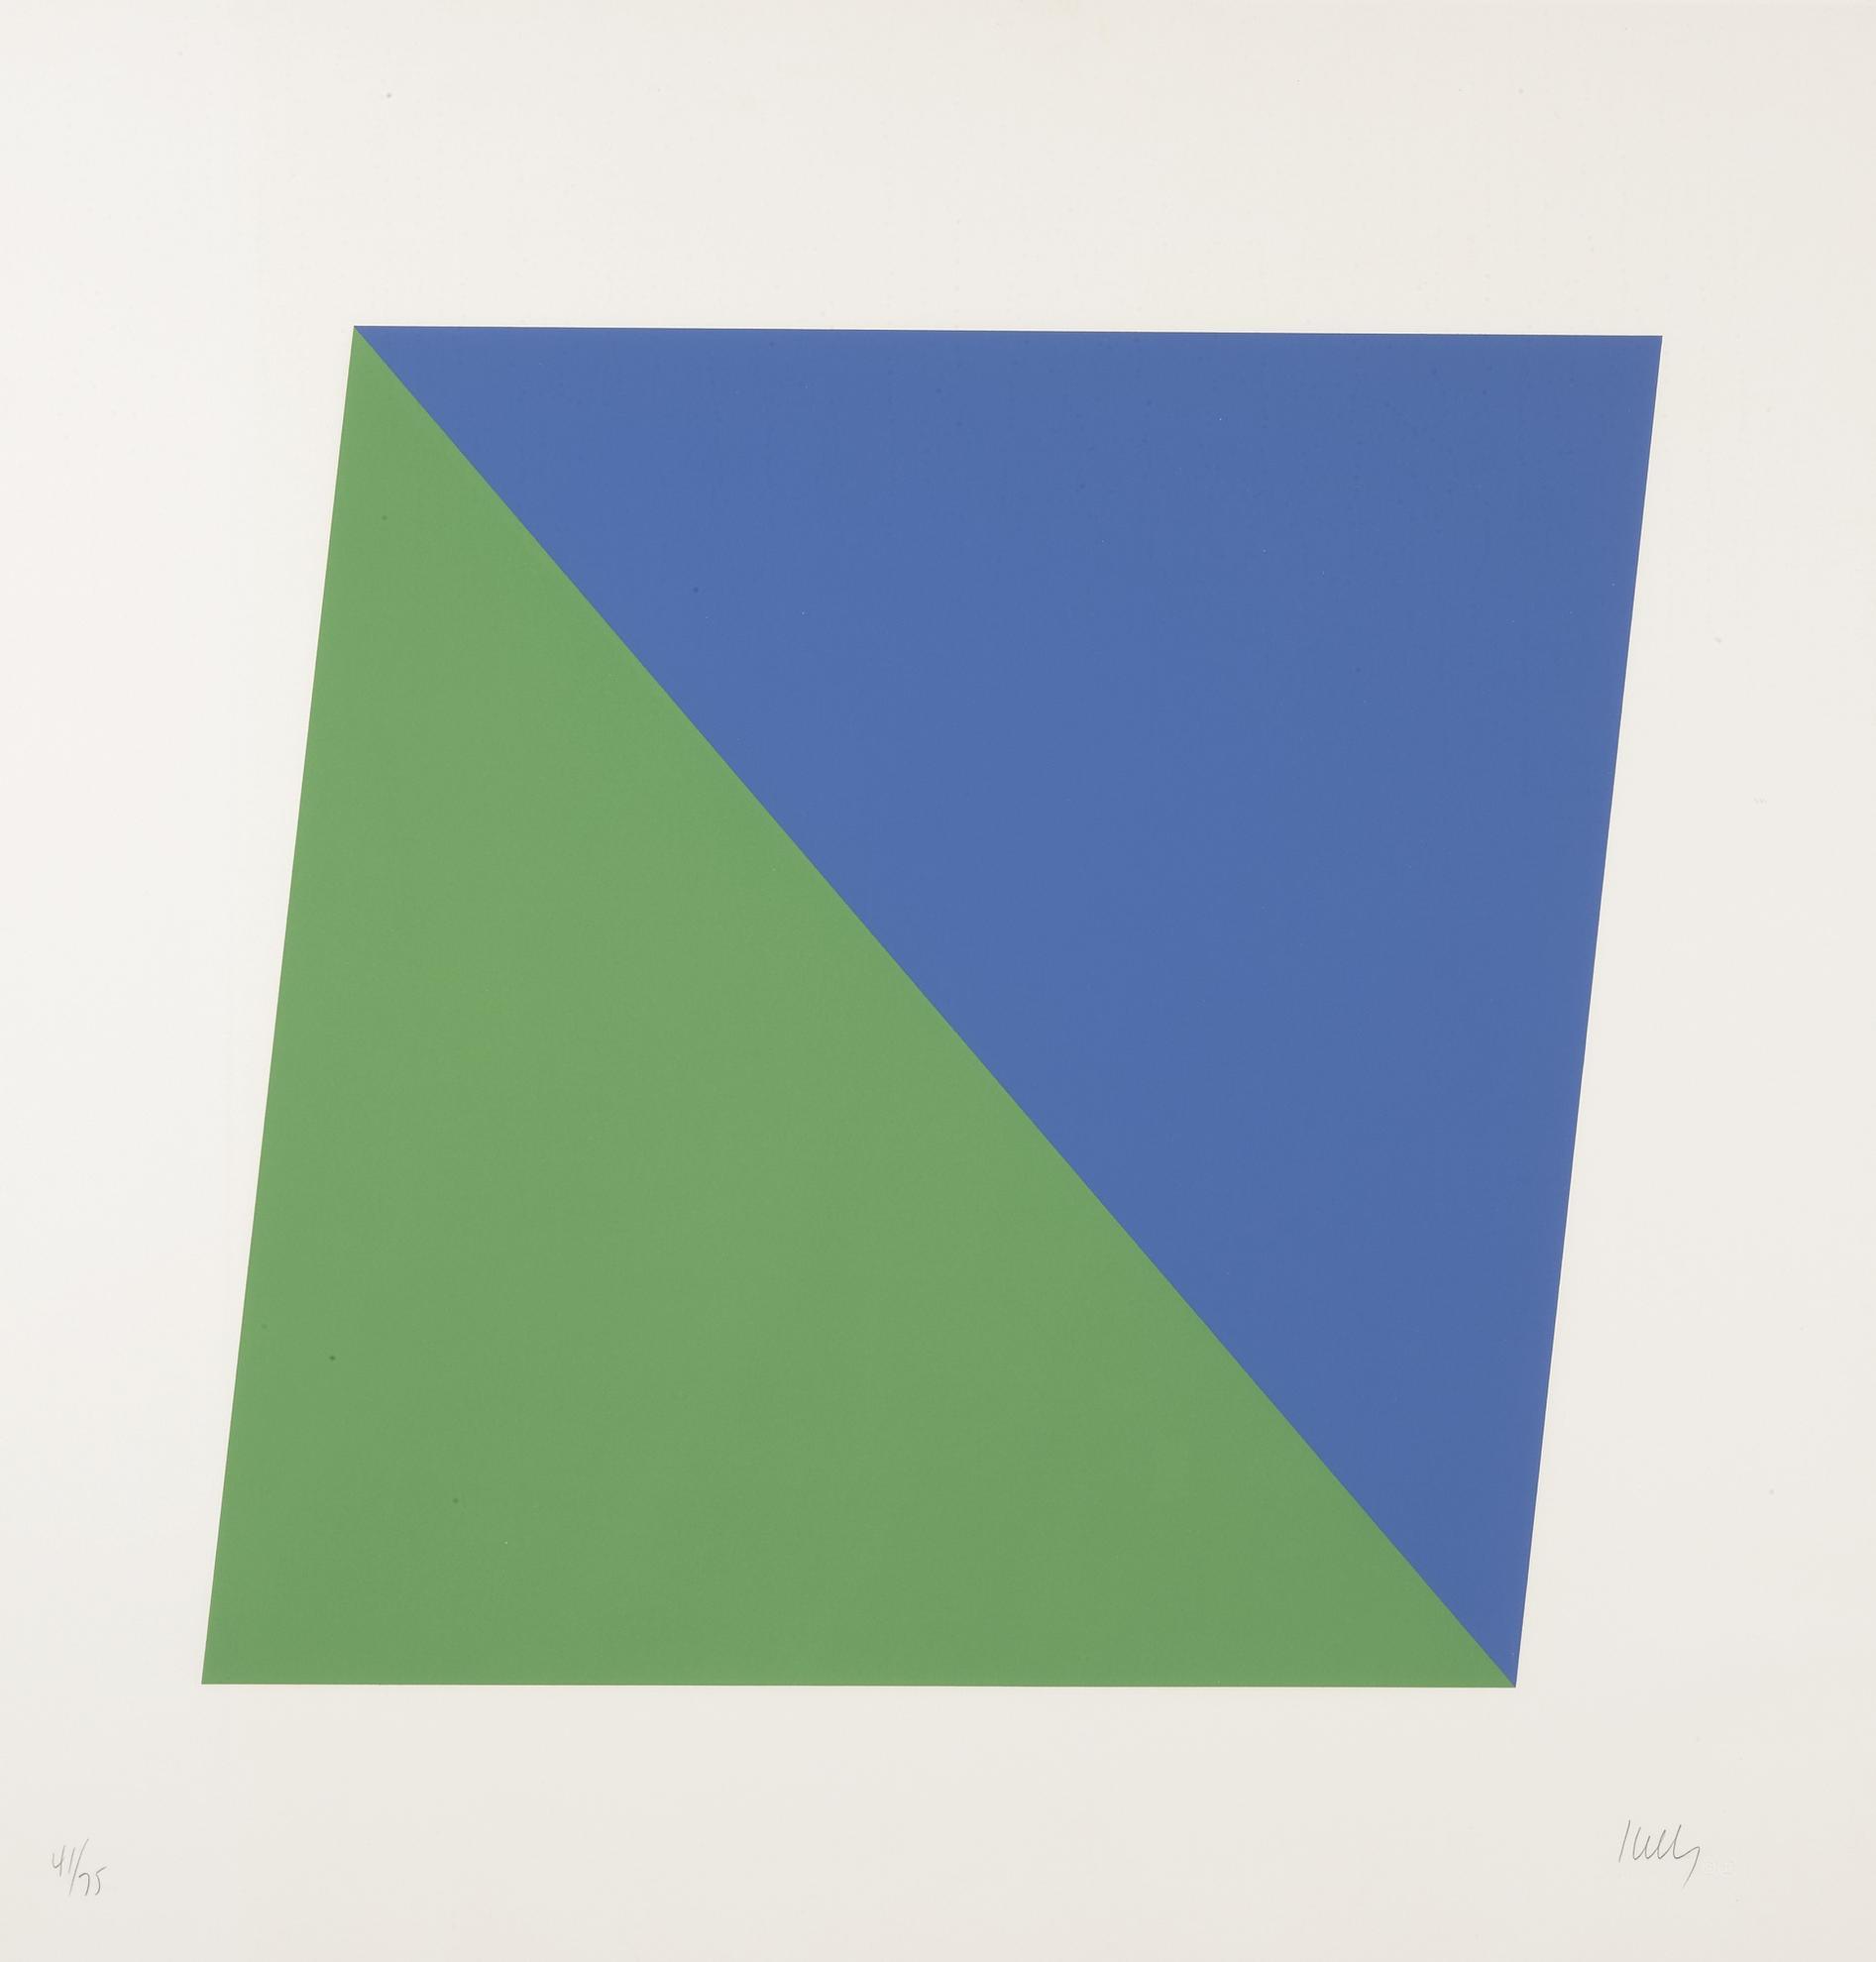 Ellsworth Kelly-Blue Green; Blue Black; And Yellow Black (A. 65, 67, 69)-1970